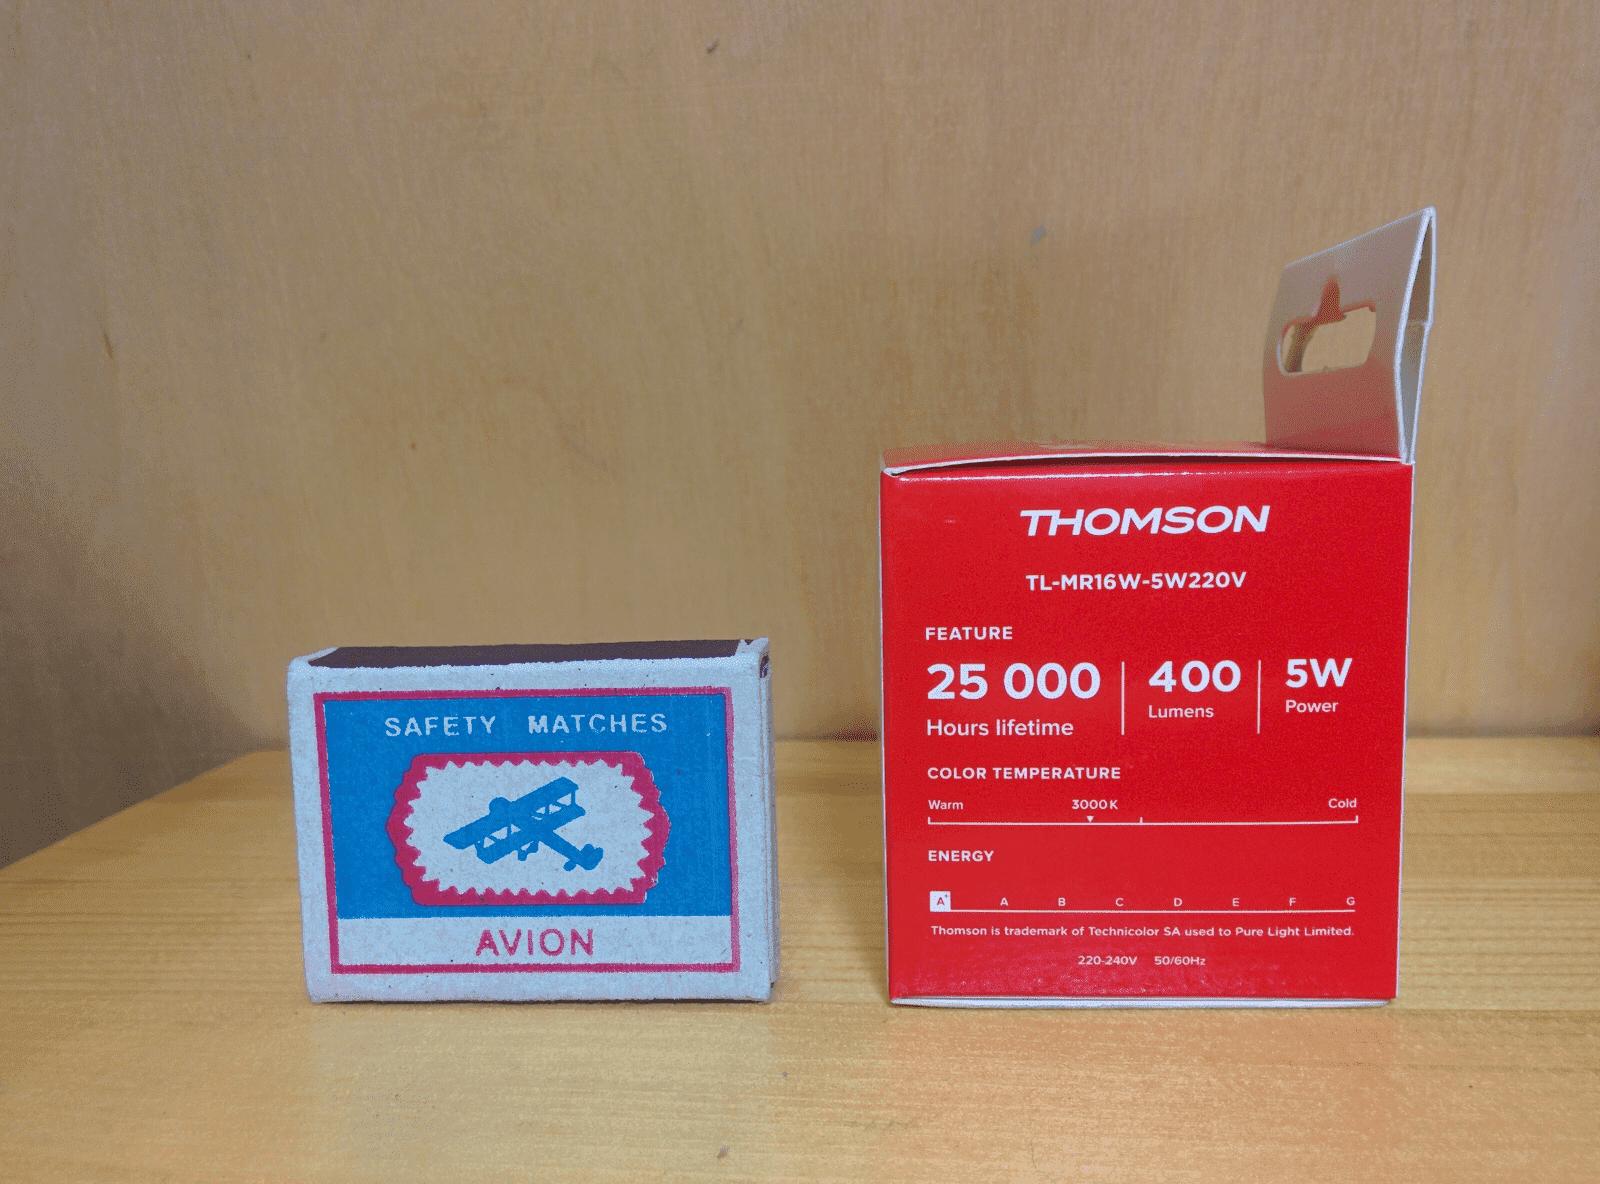 Thomson TL-MR16W-5W220V характеристики